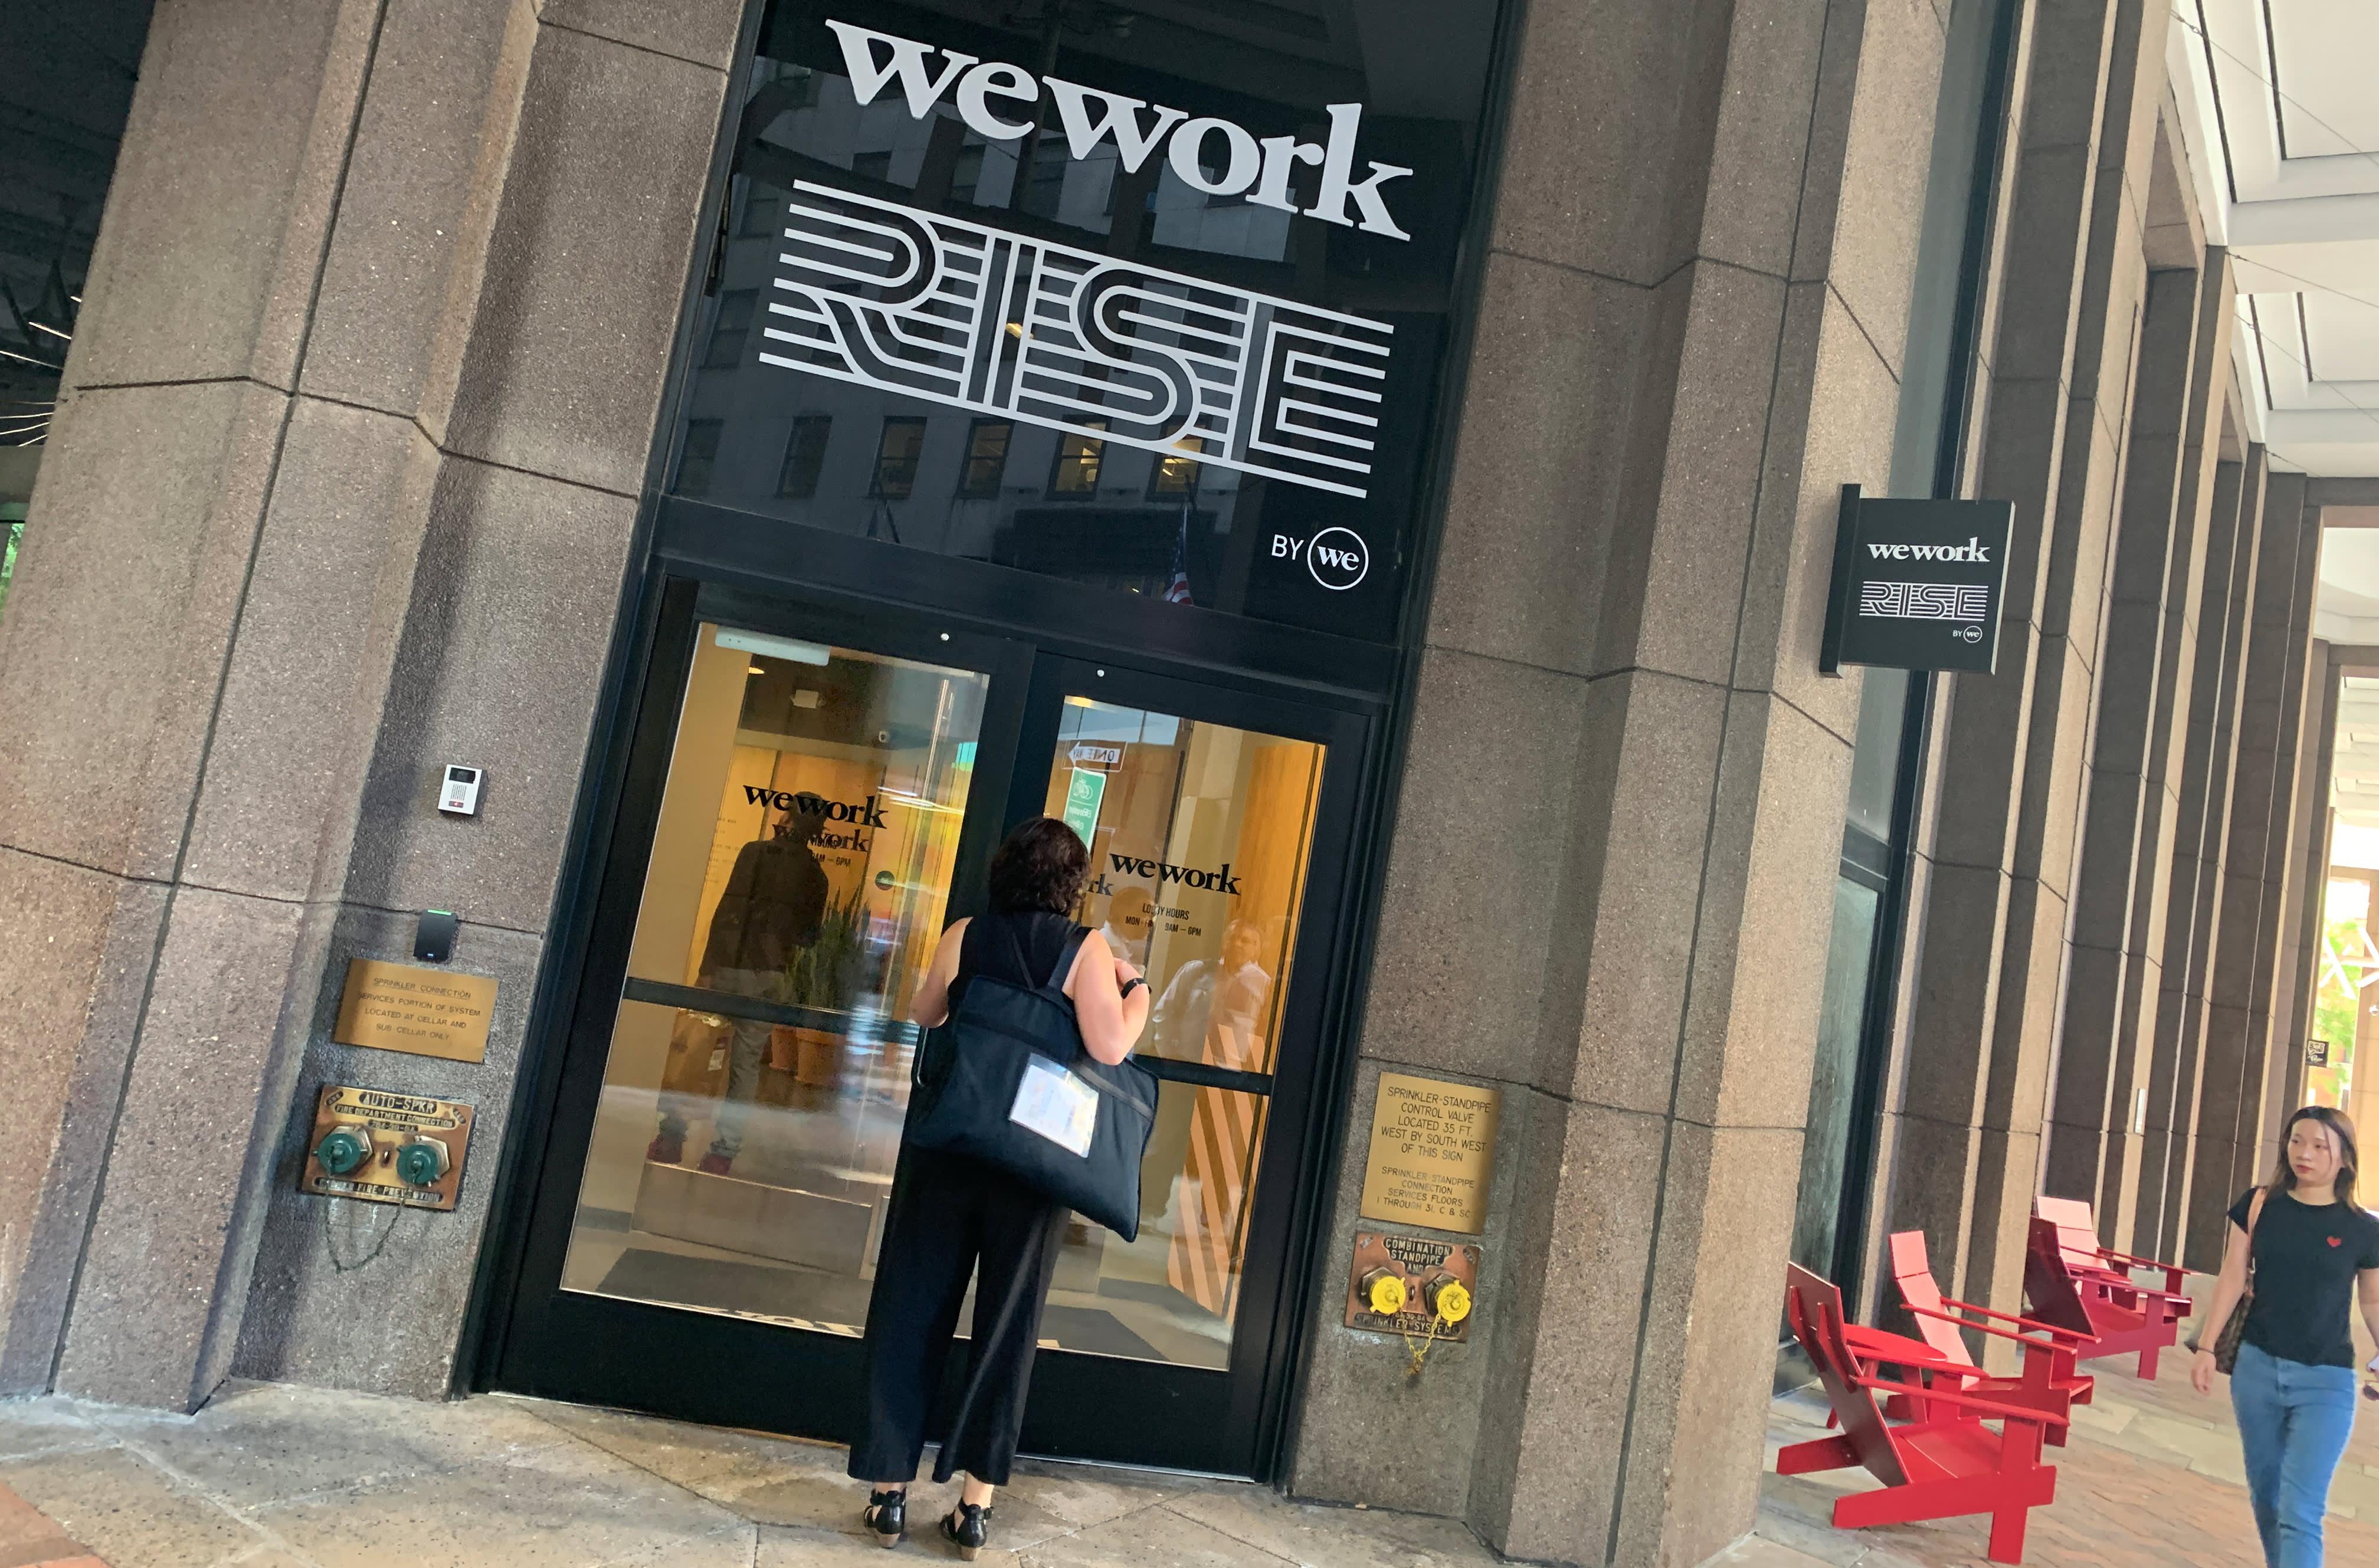 Nasdaq executive is 'bullish' on WeWork and hopes the company will go public eventually